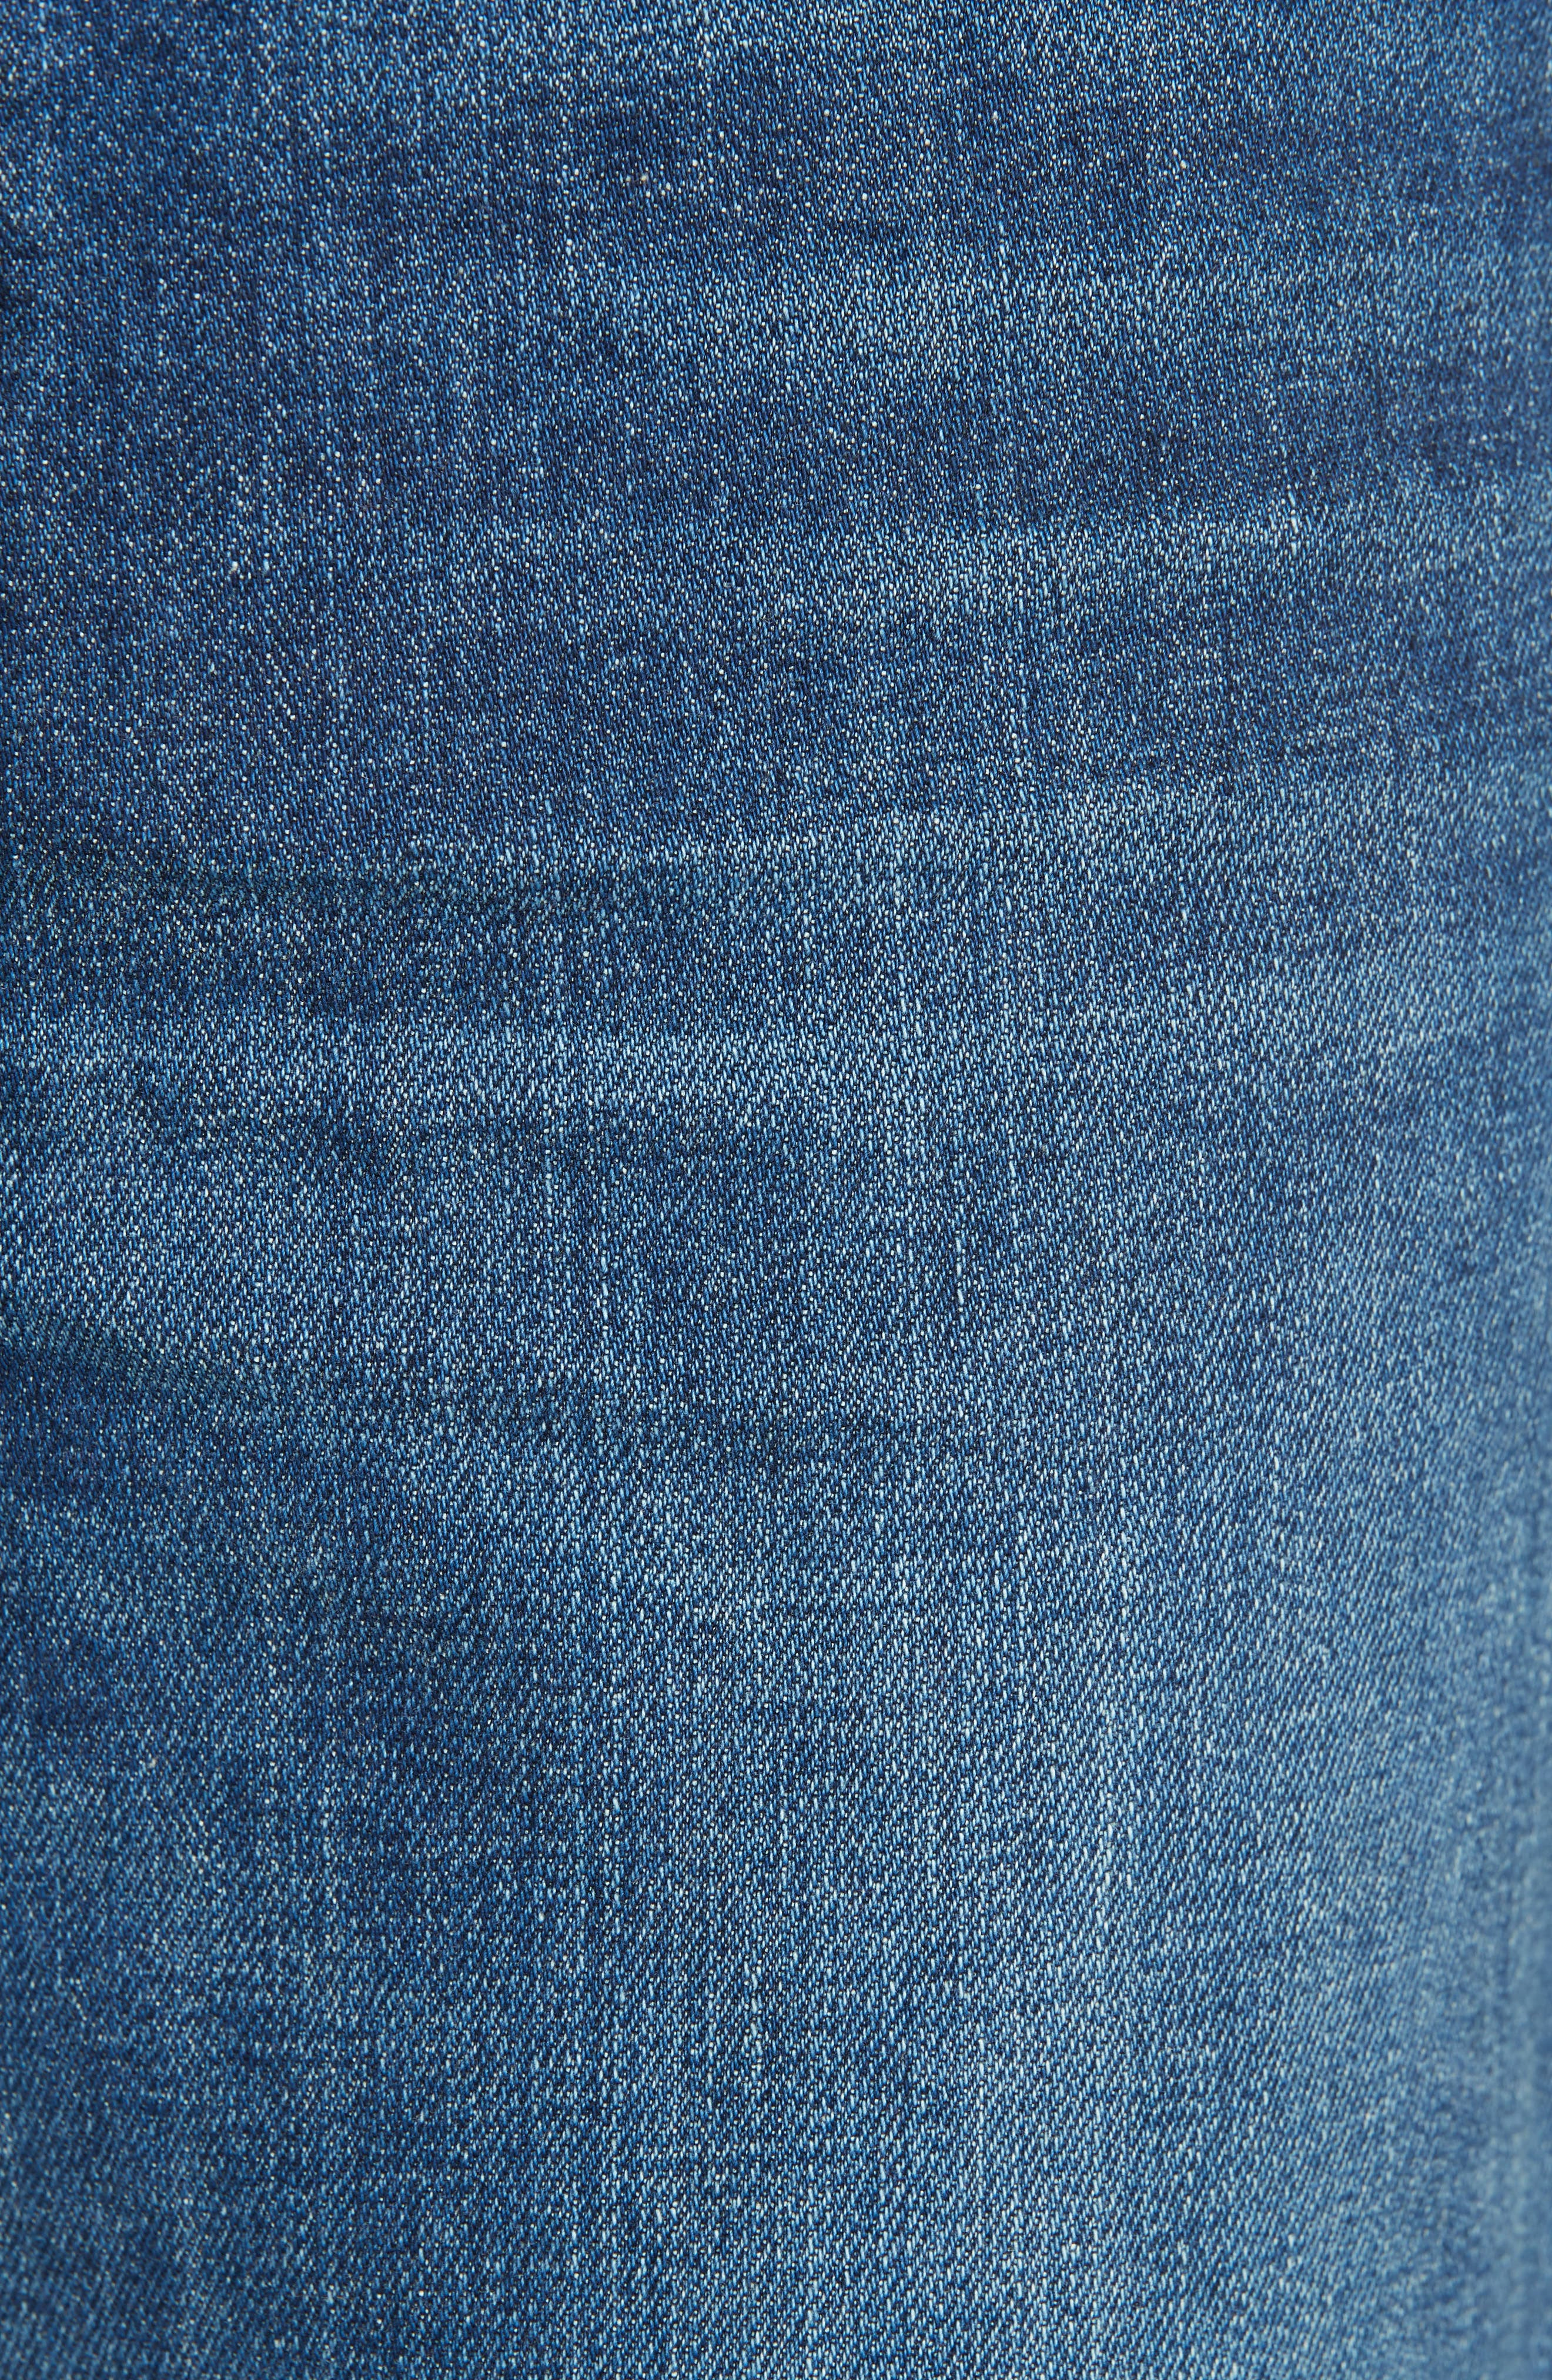 Wide Flare Leg Jeans,                             Alternate thumbnail 5, color,                             TRUE VINTAGE WASH